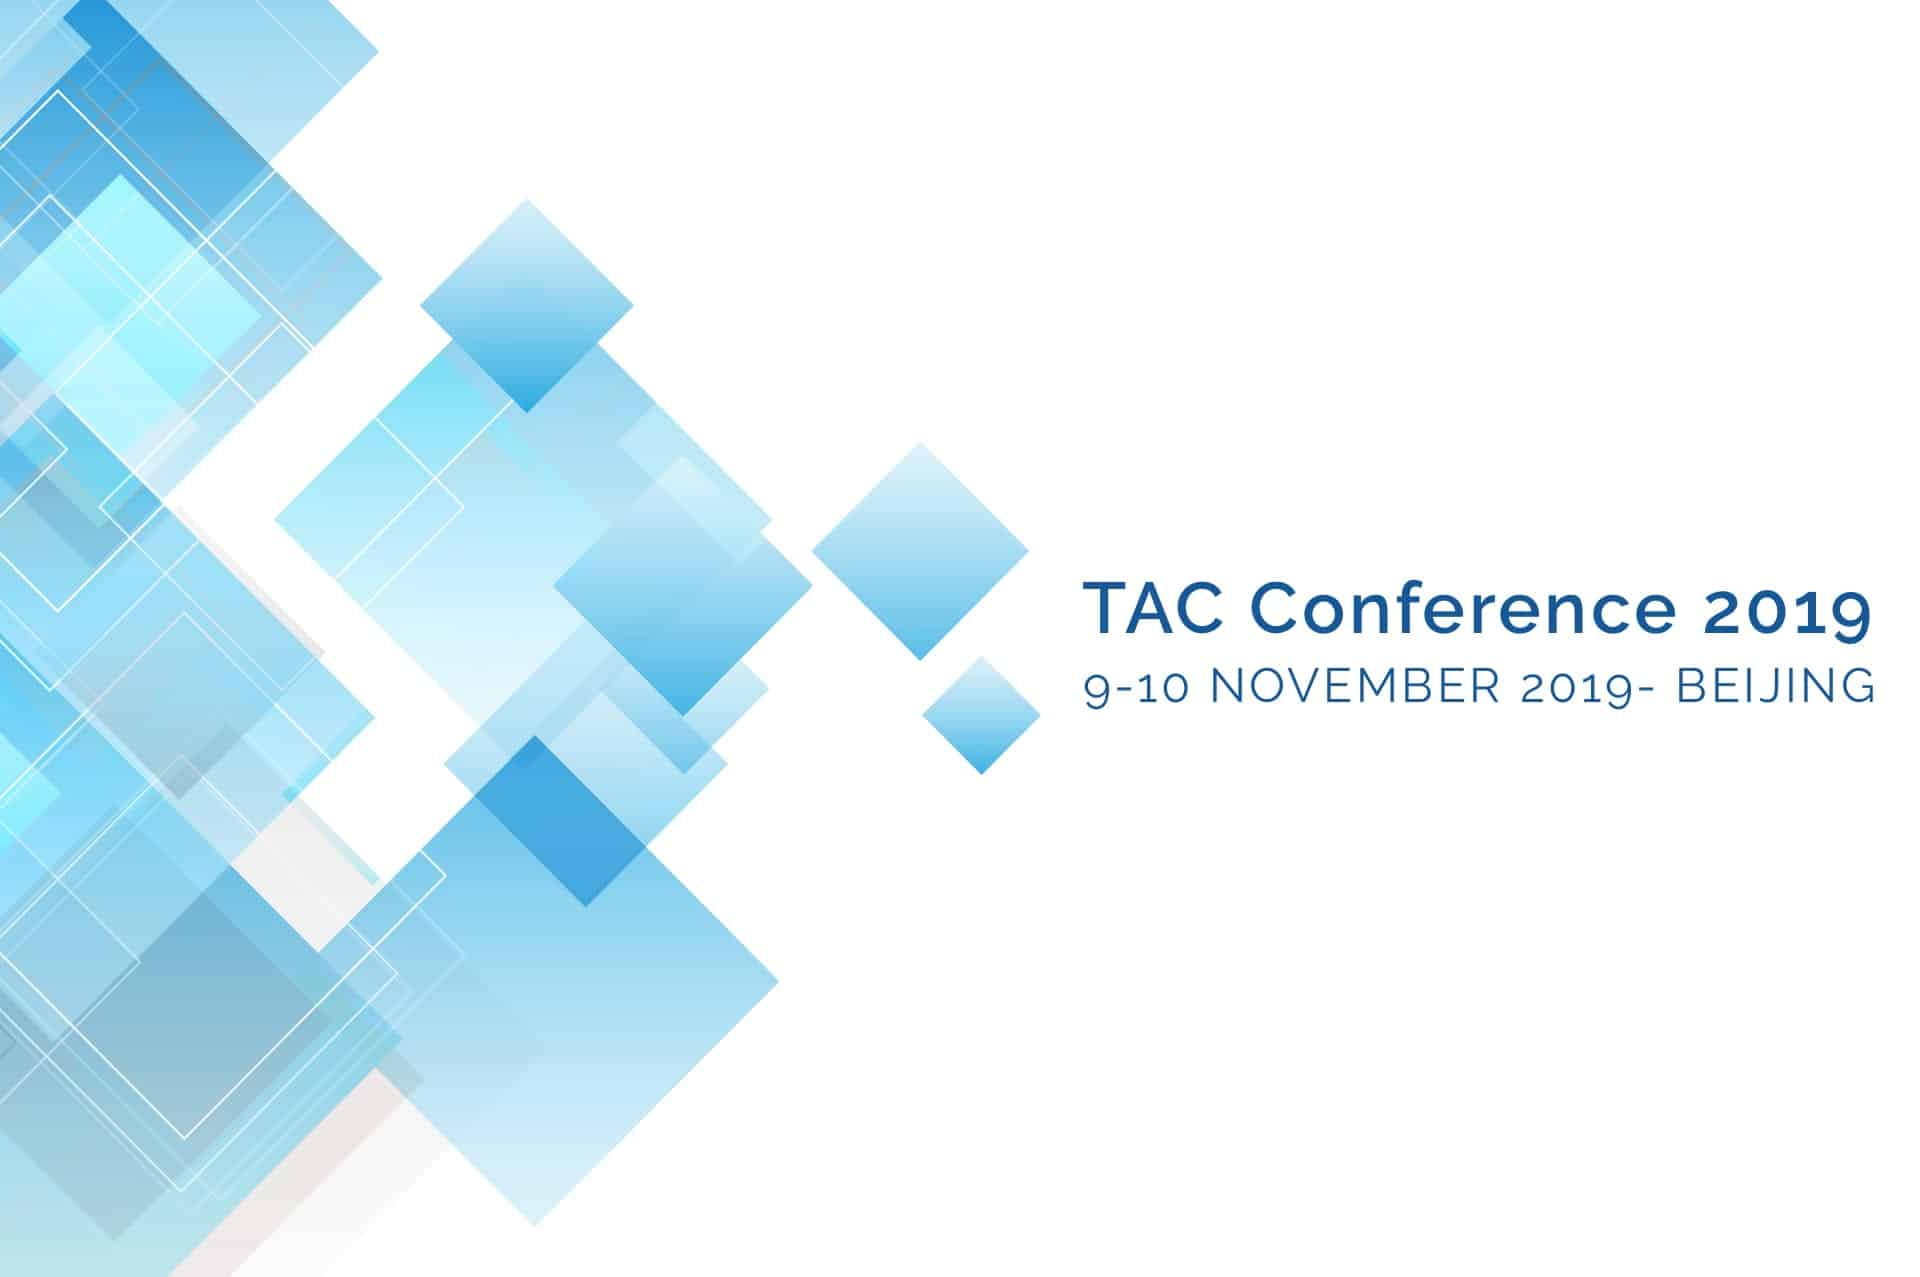 TAC Conference 2019